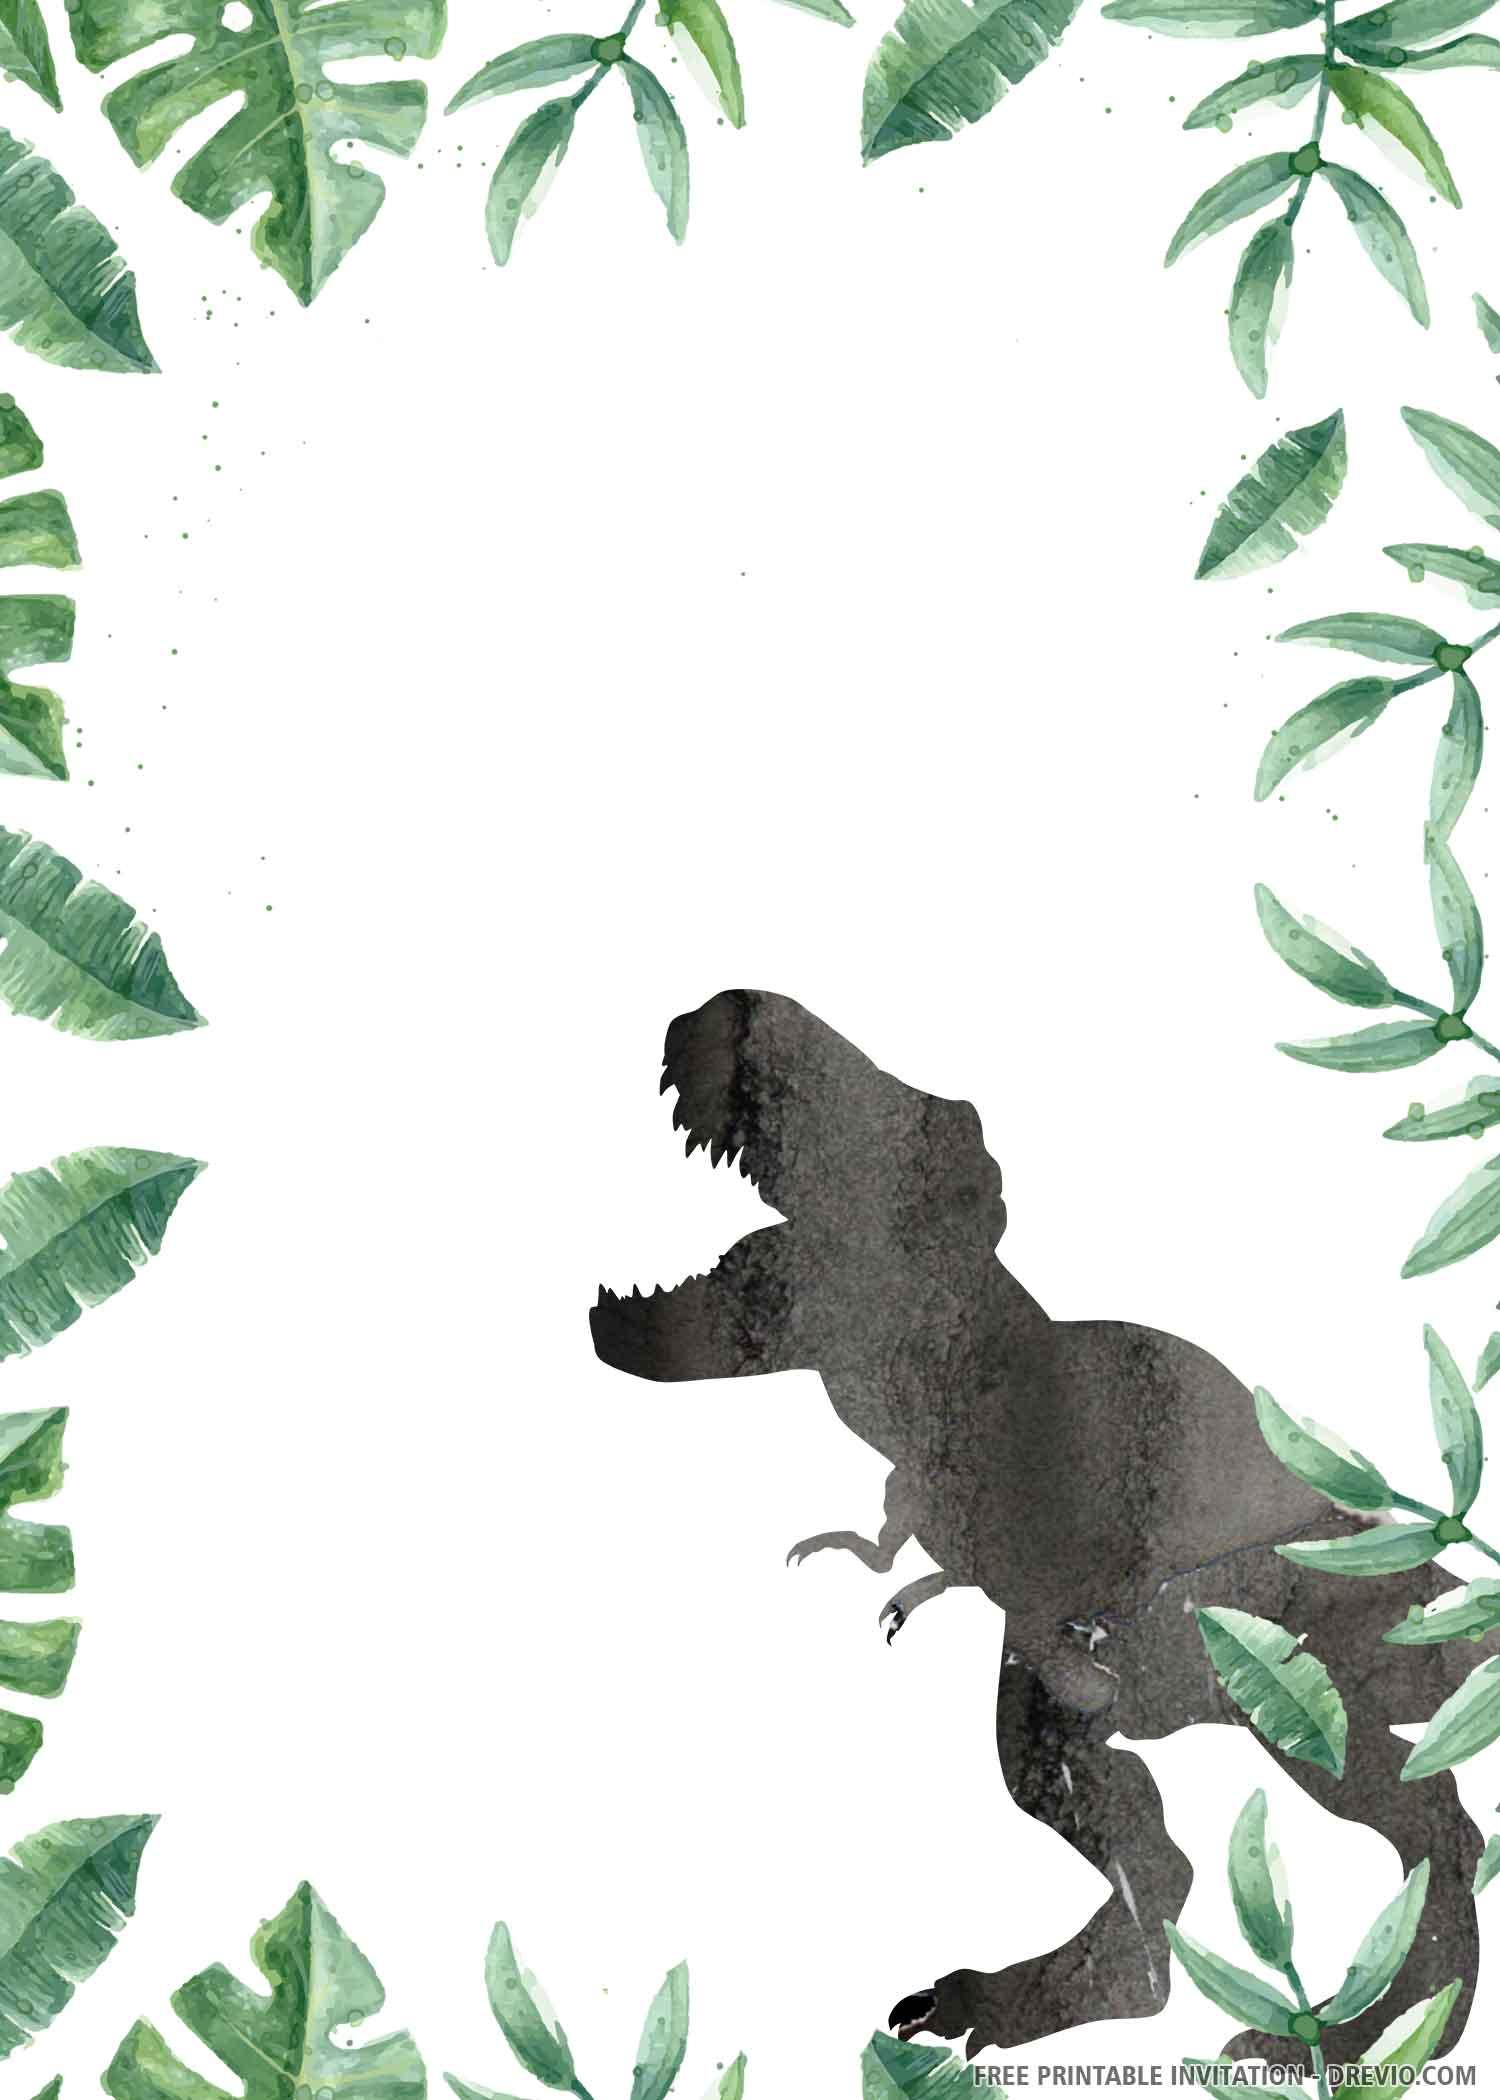 Free Printable Wild Dinosaur Birthday Invitation Template Download Hundreds Free Printable Birthday Invitation Templates